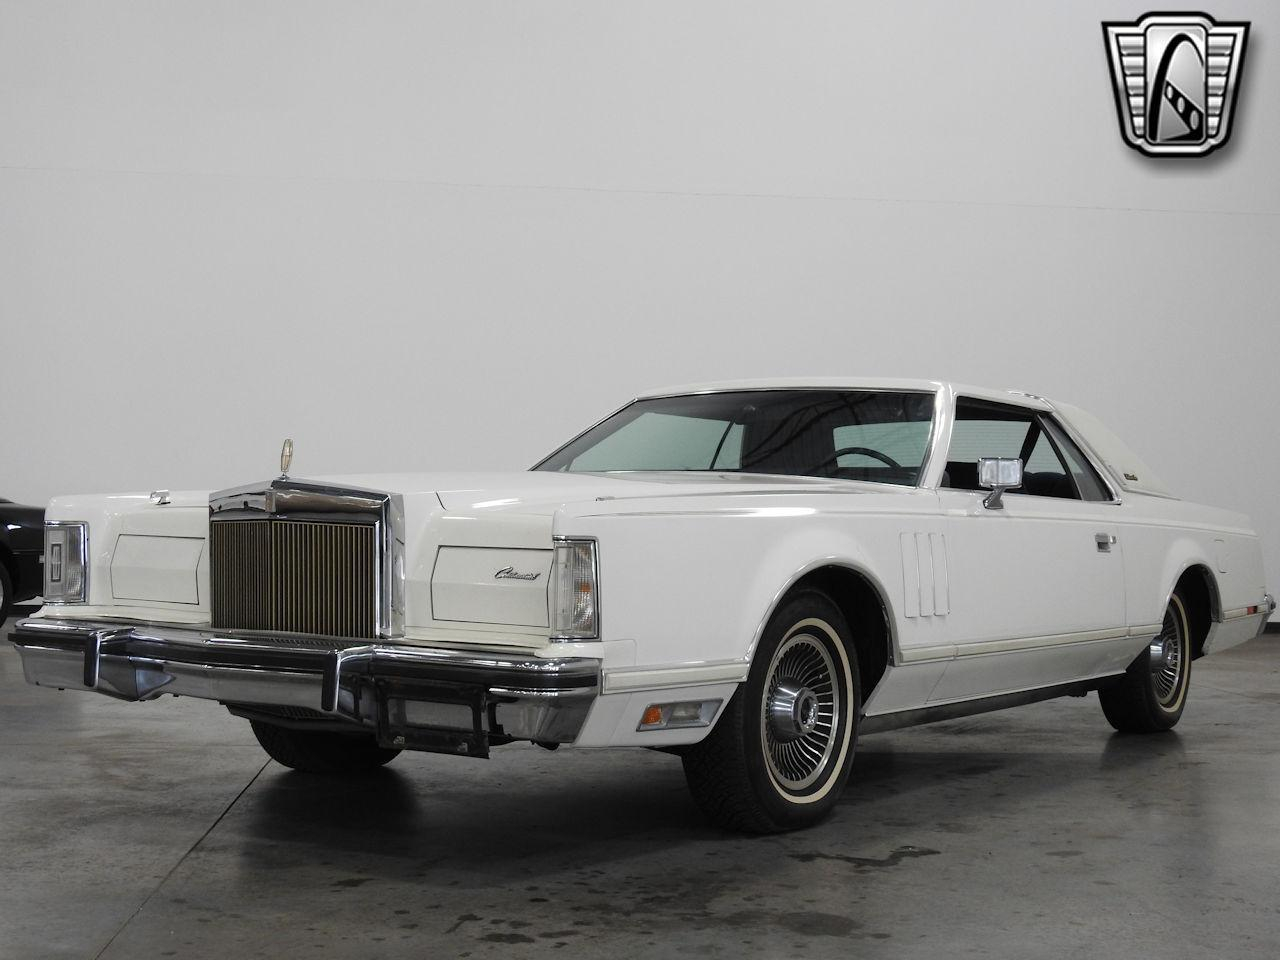 1979 Lincoln MKV 21